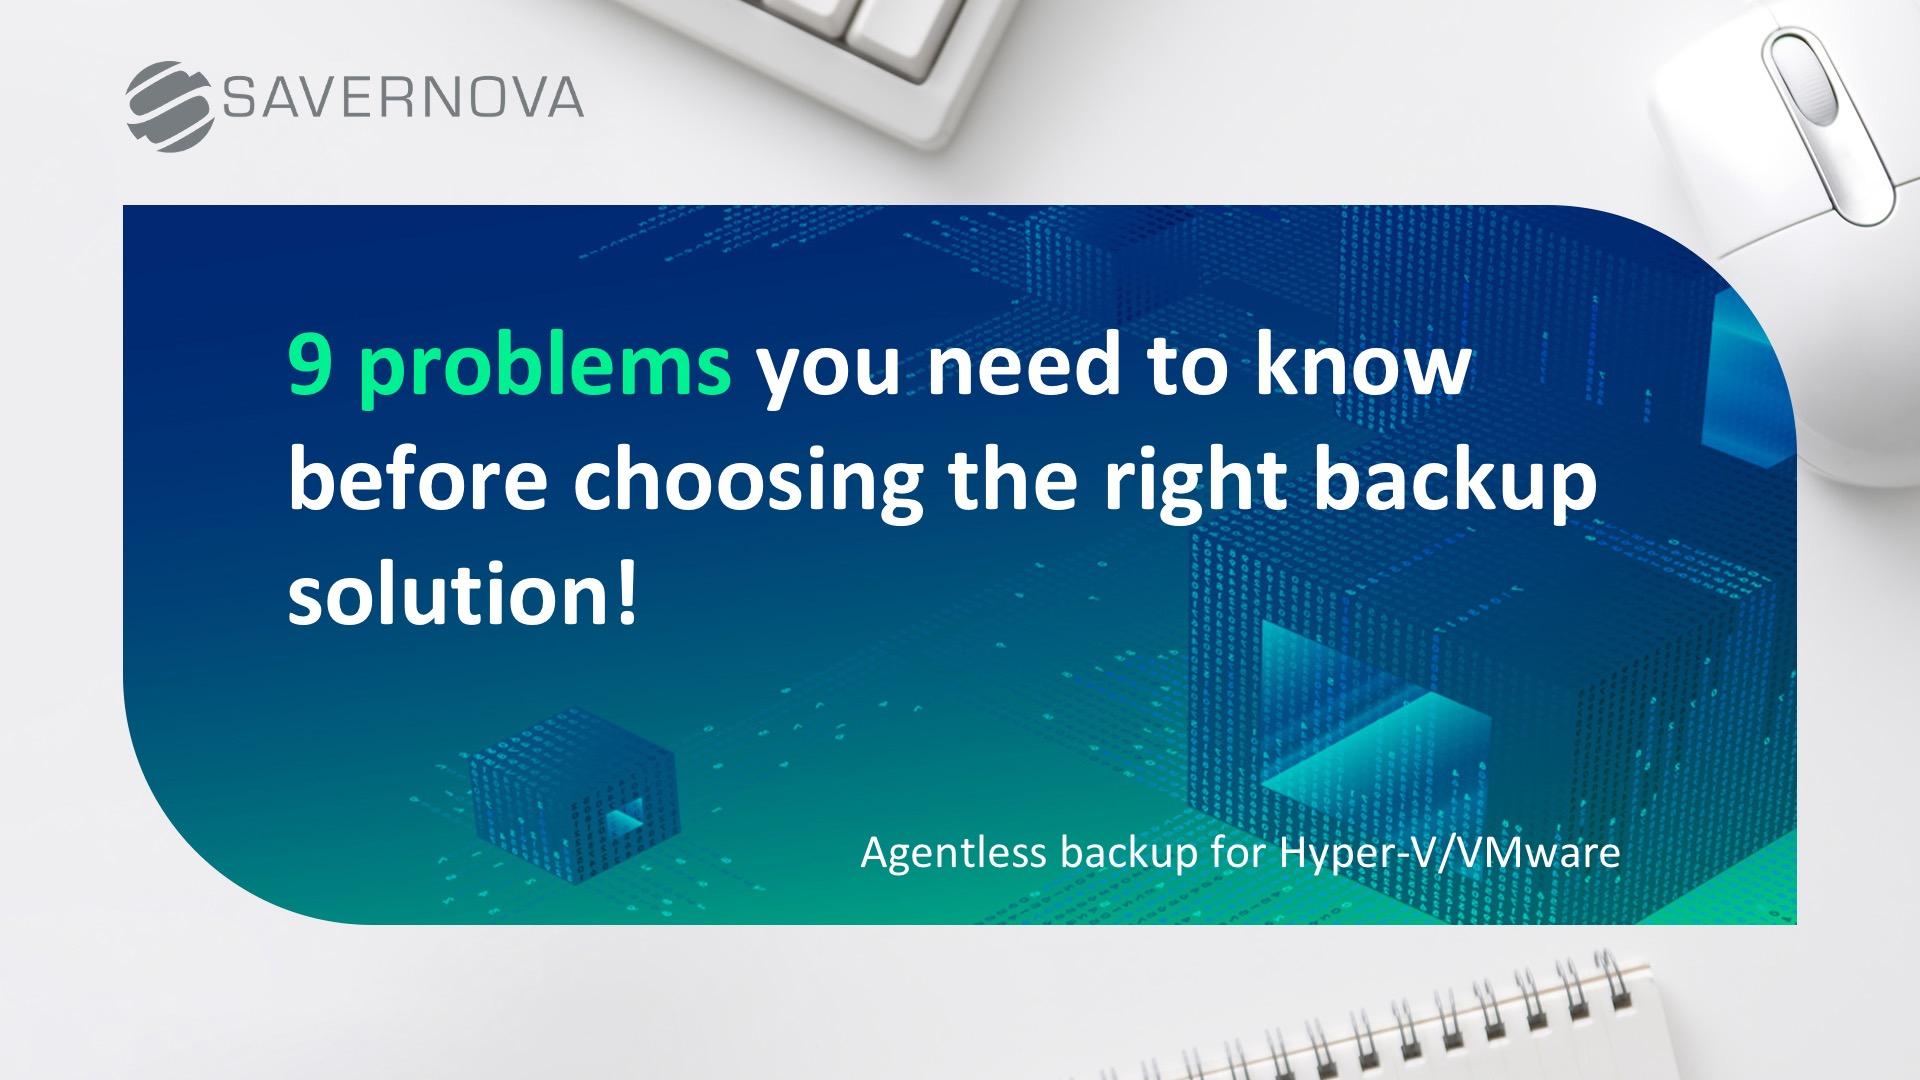 9 backup problems